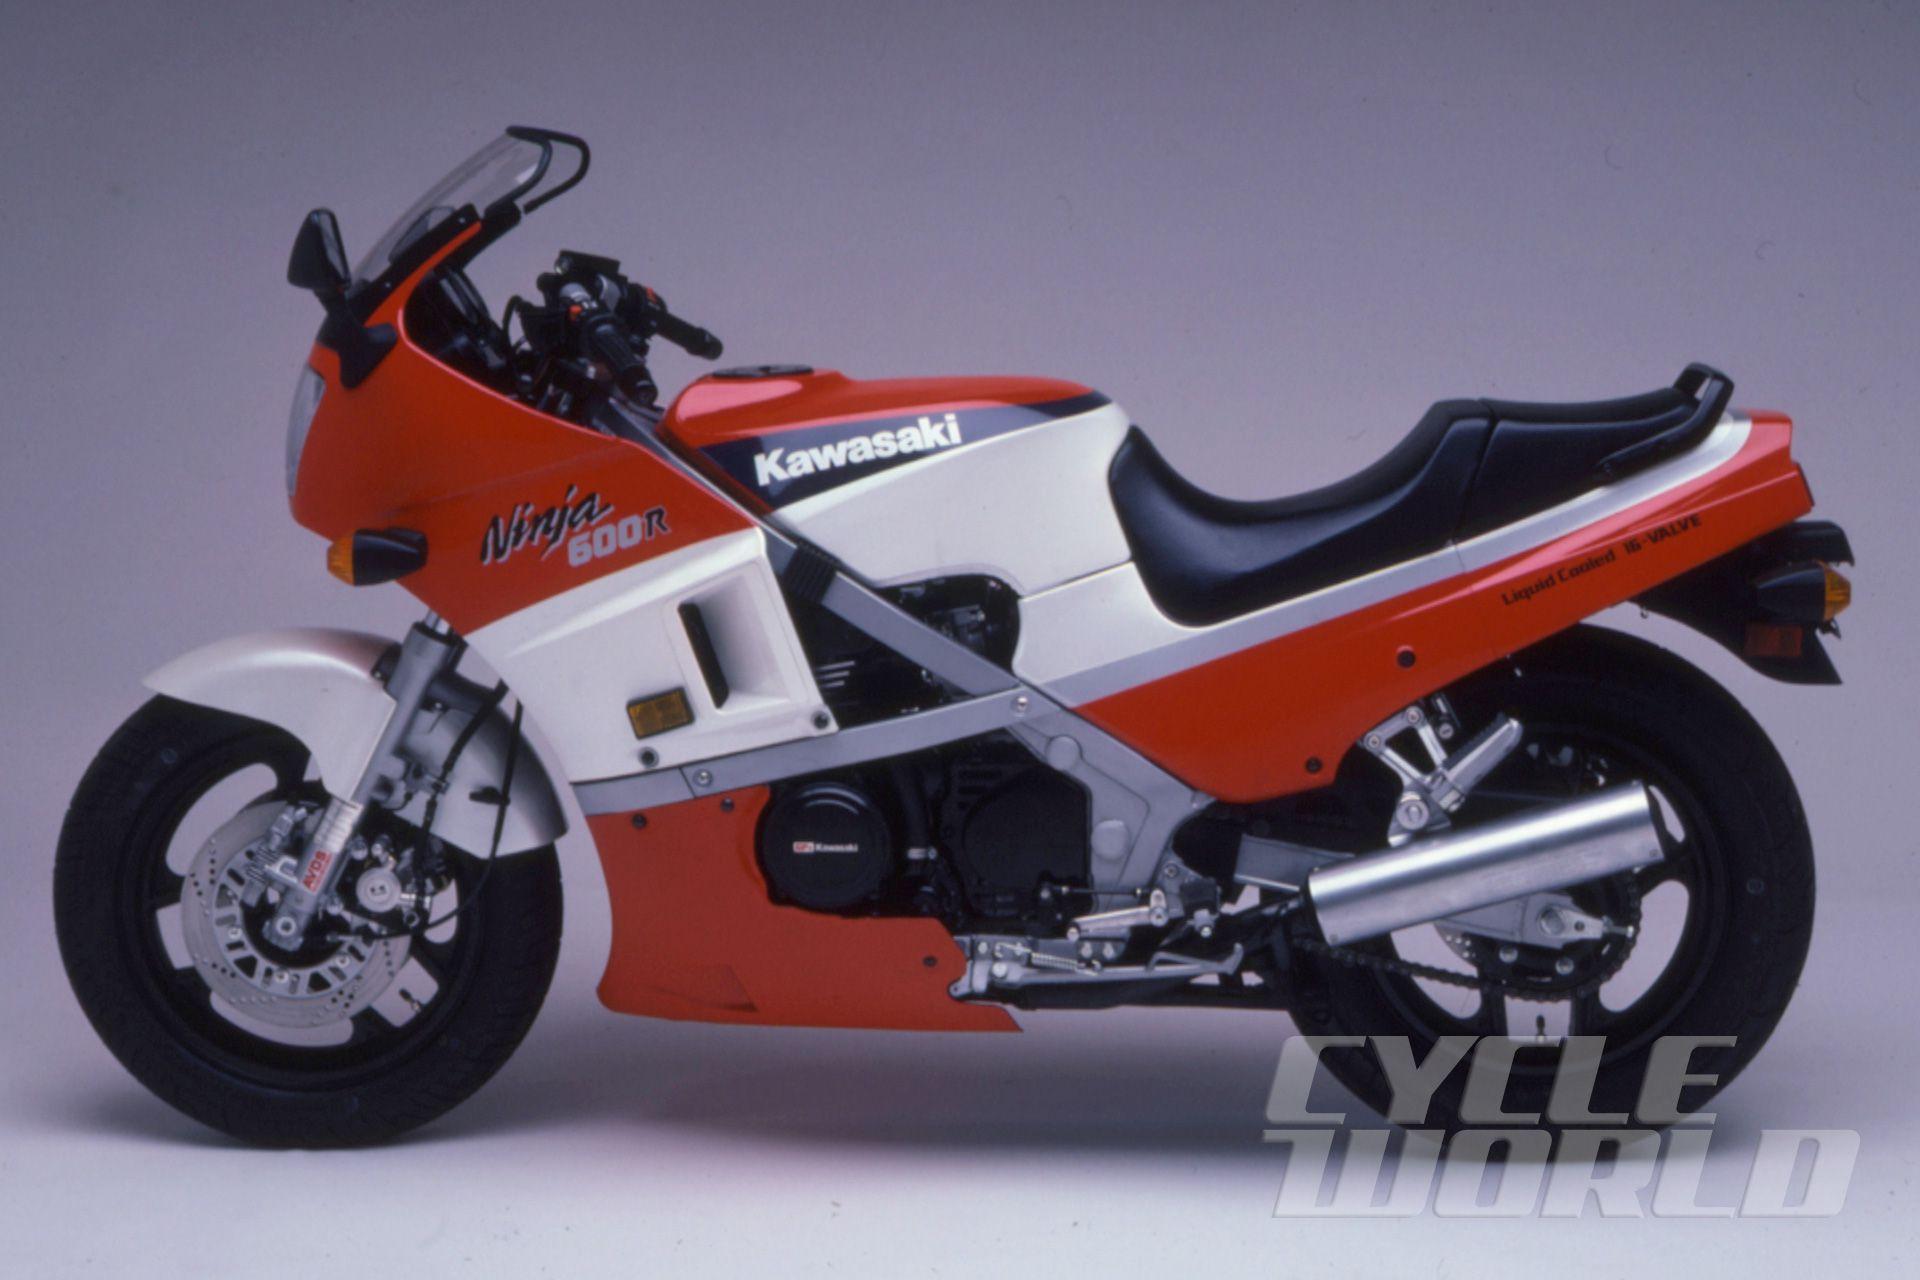 hight resolution of kawasaki ninja motorcycle history 1984 gpz900 to 1990 zx 11 cycle world